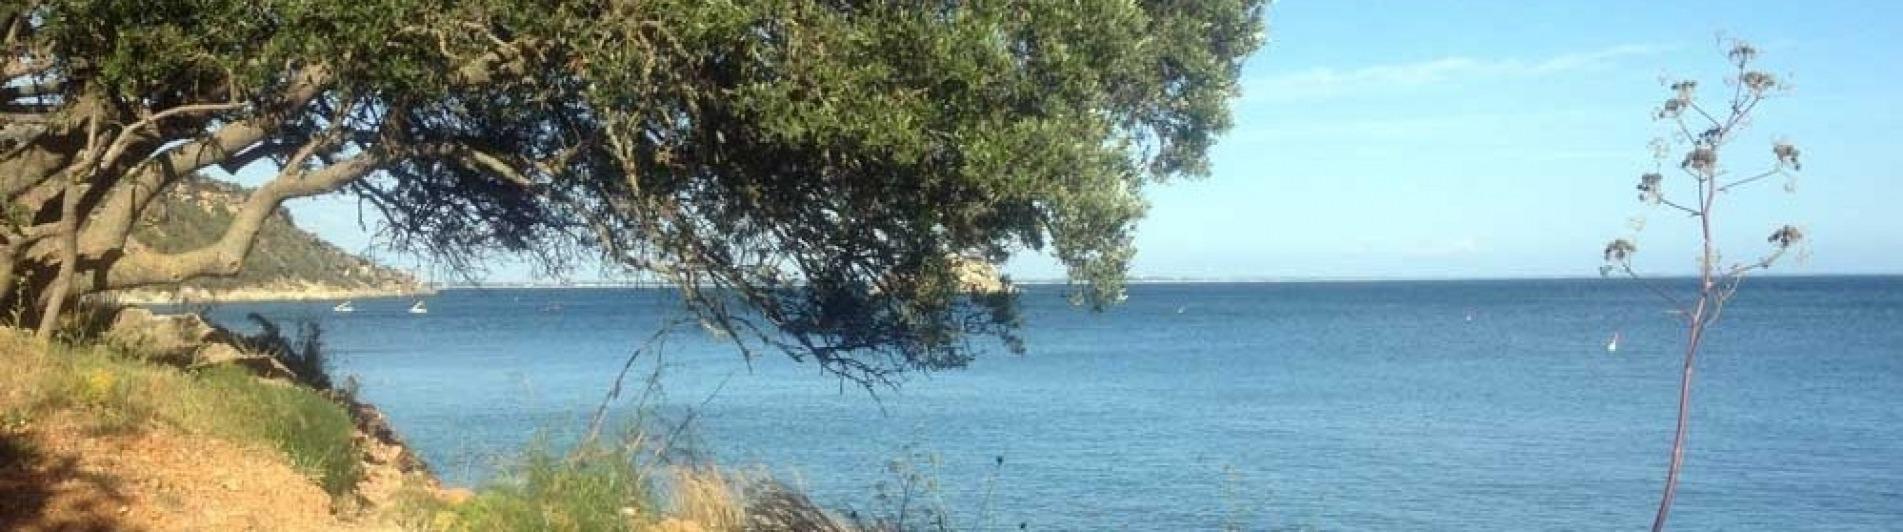 Arrabida_Lisbon_Private_Tours_2a